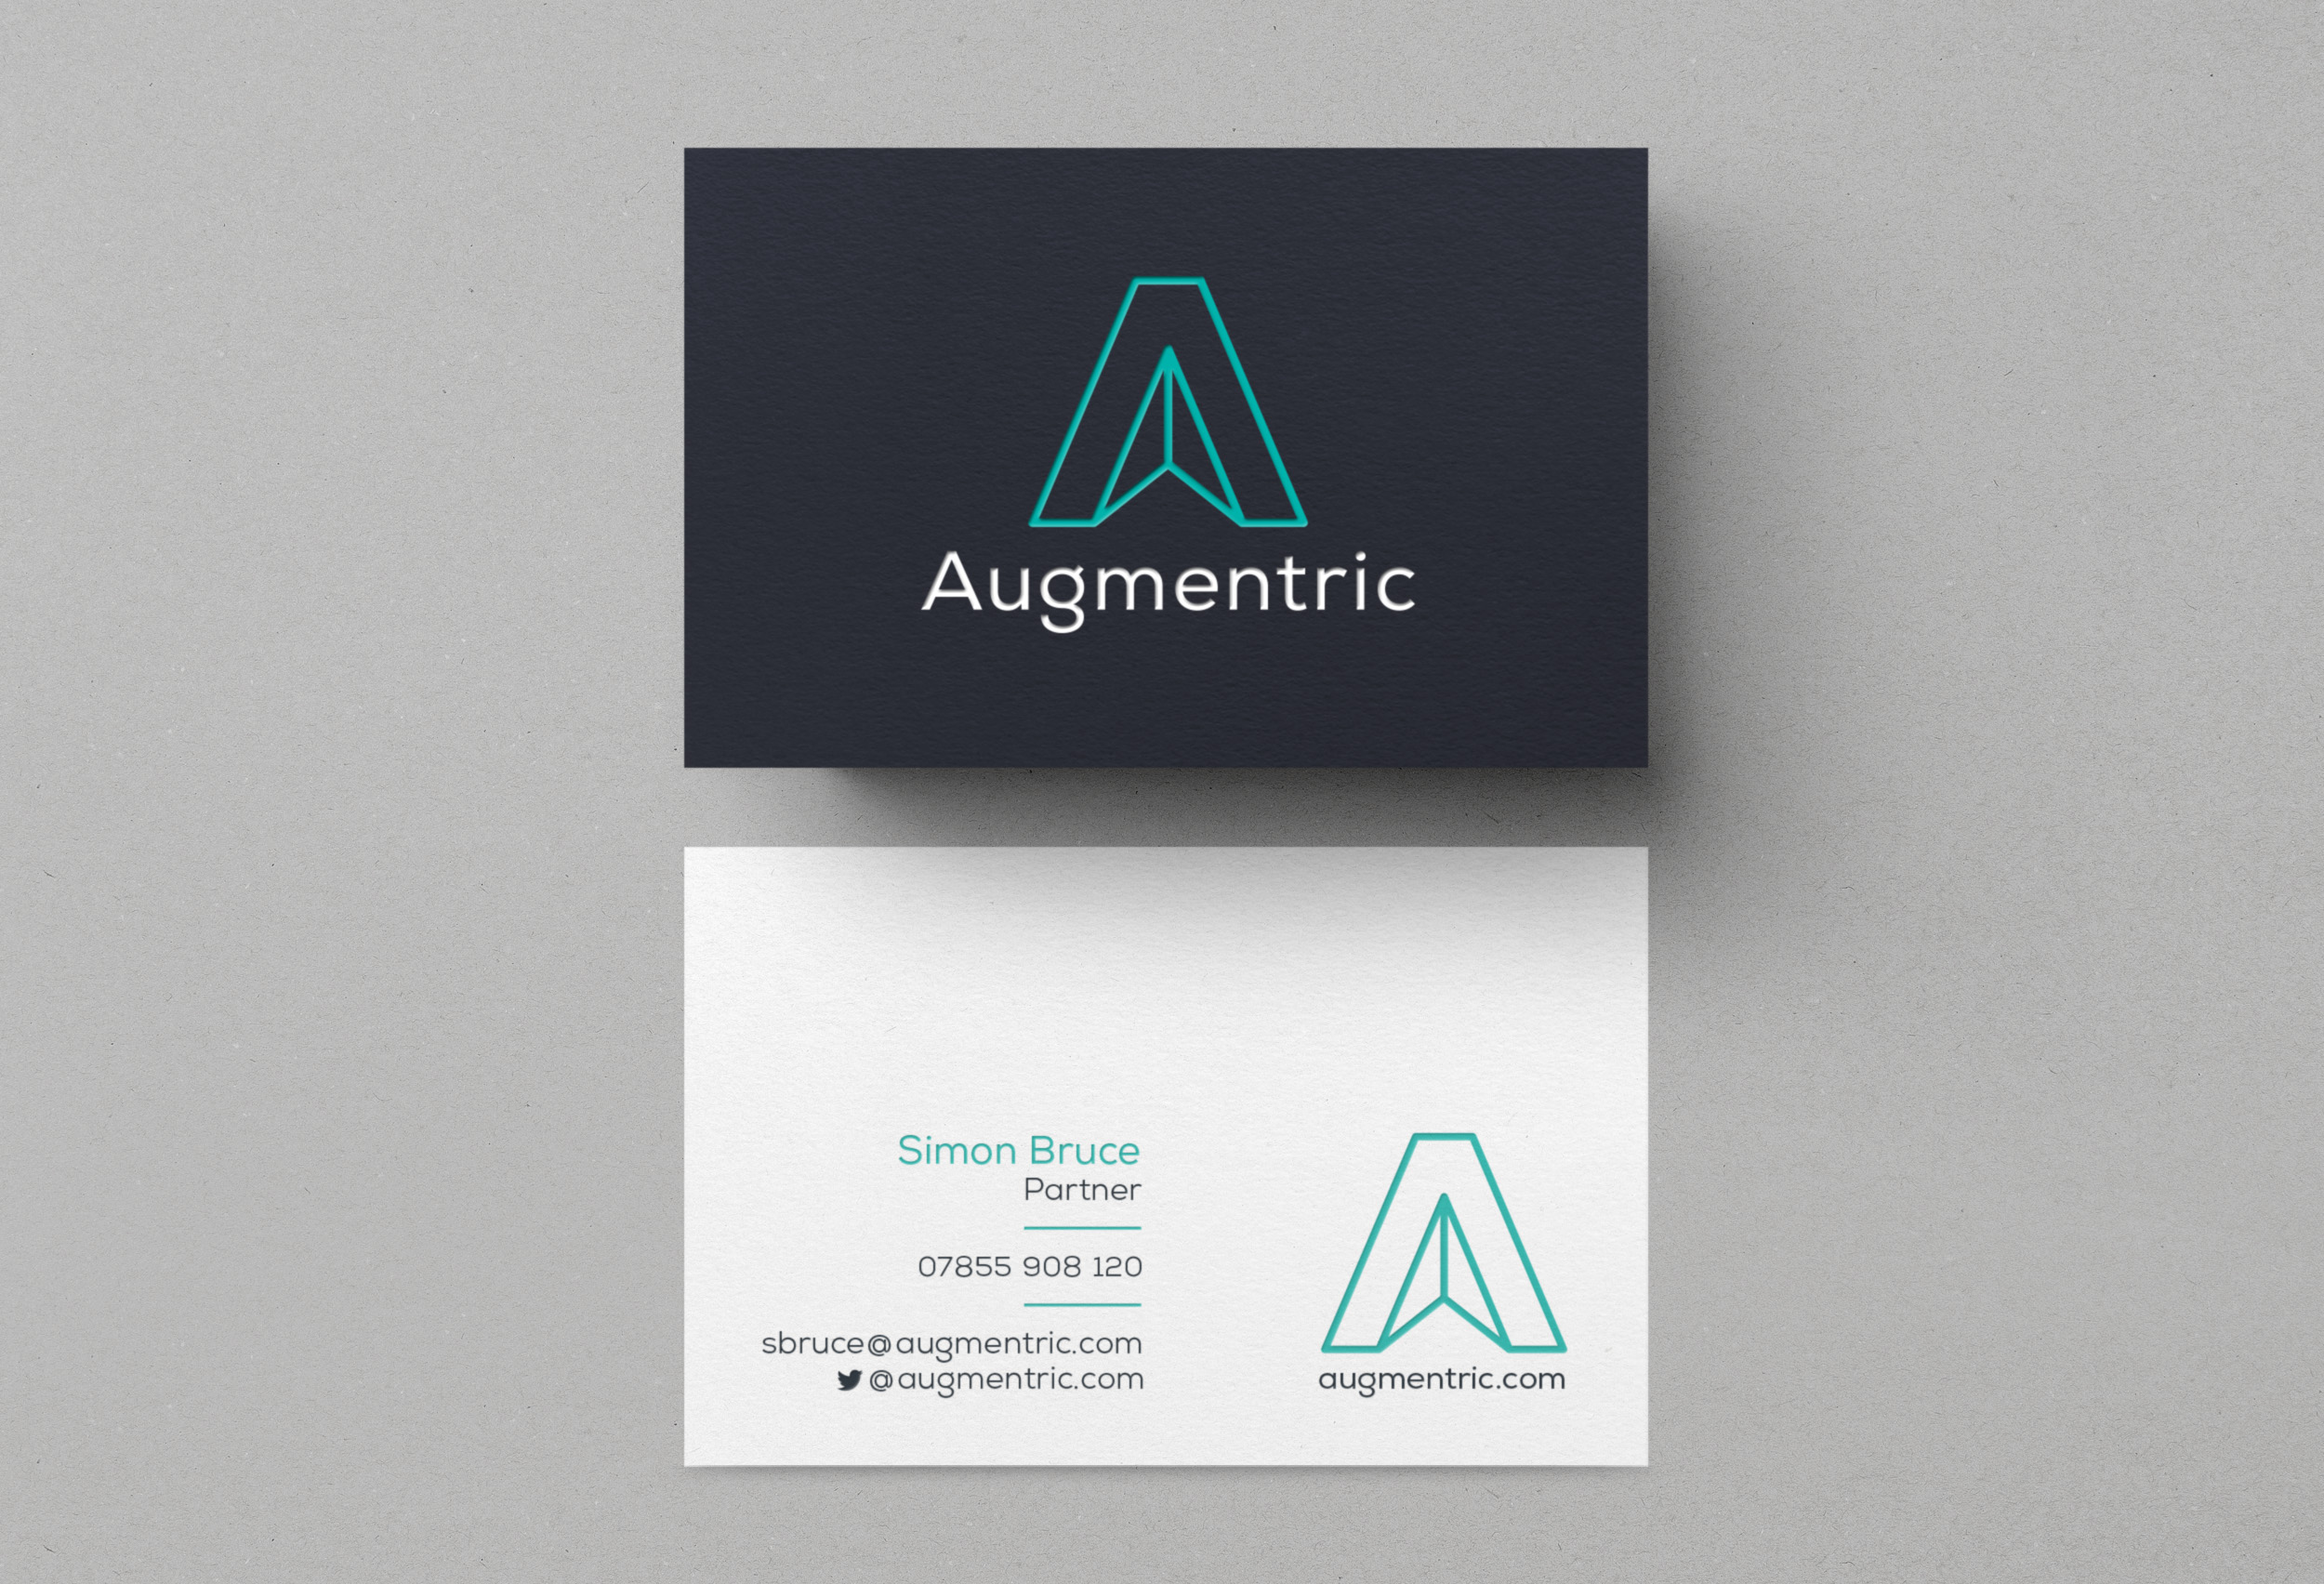 Augmentric - Brand Identity